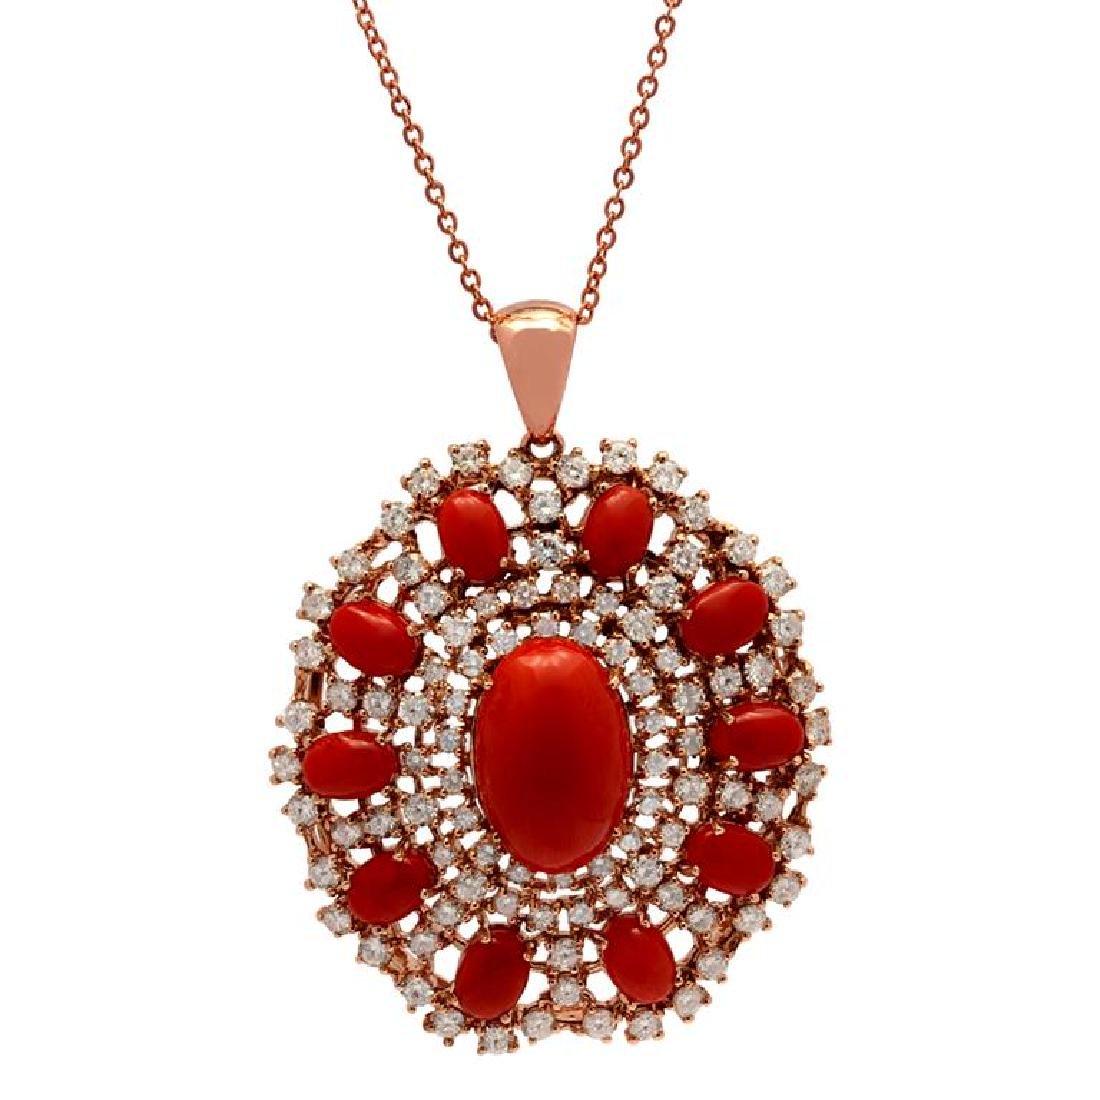 14k Rose Gold 15.96ct Coral 5.51ct Diamond Pendant